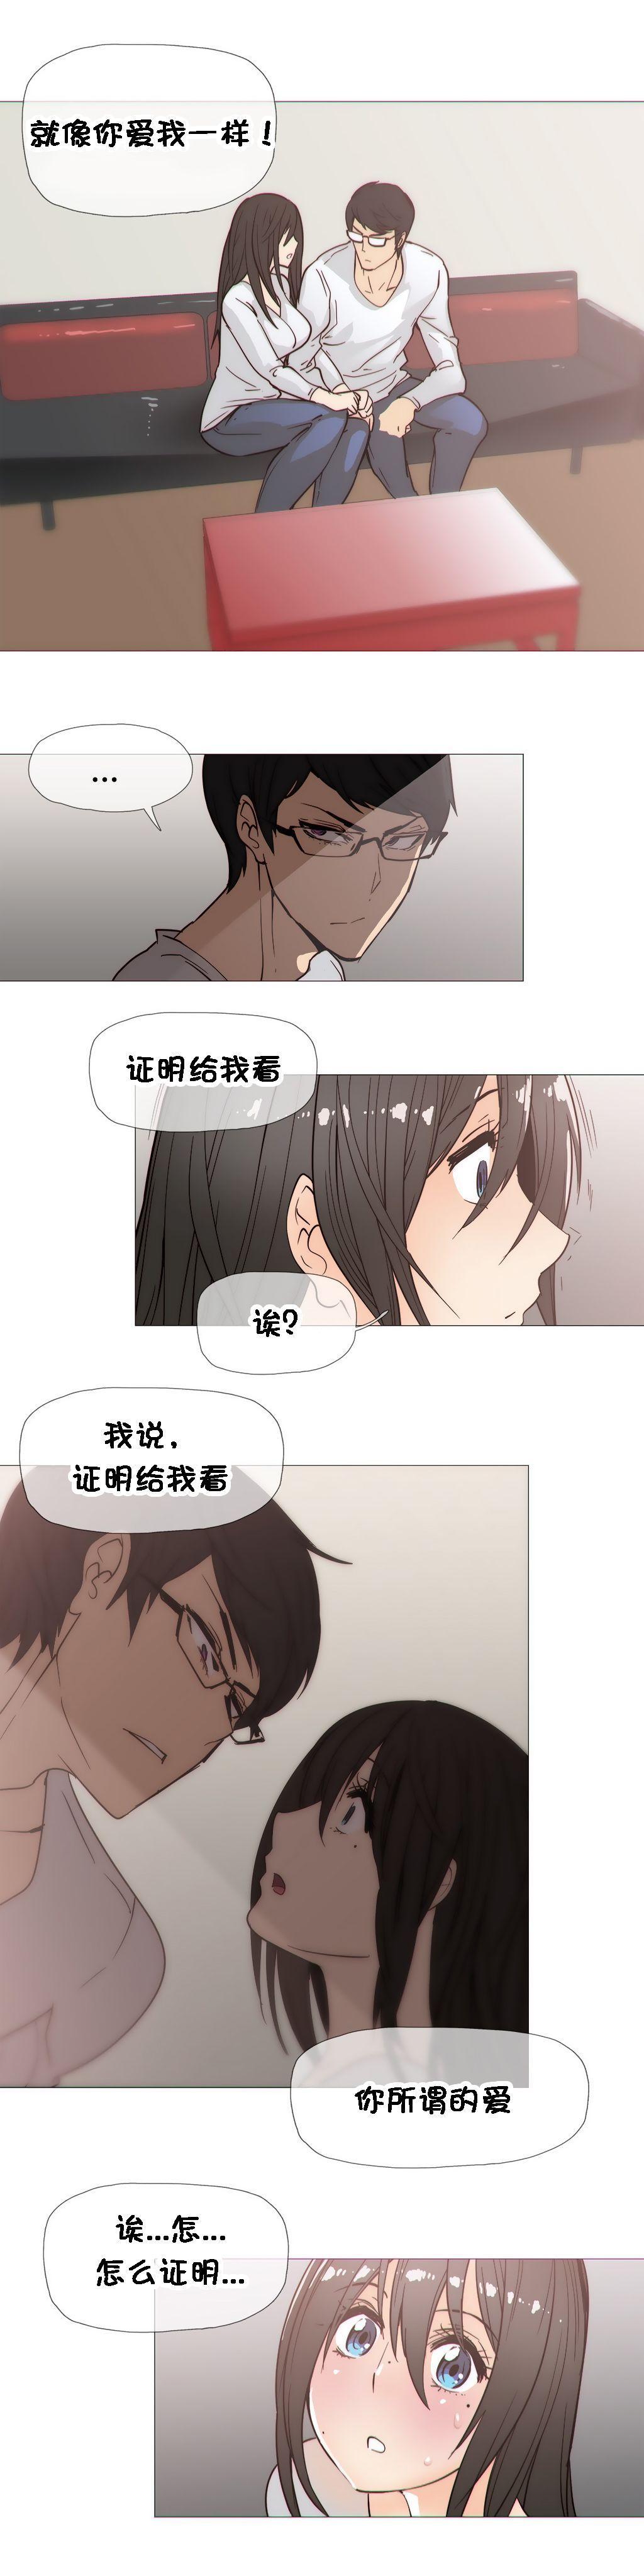 HouseHold Affairs 【卞赤鲤个人汉化】1~33话(持续更新中) 607